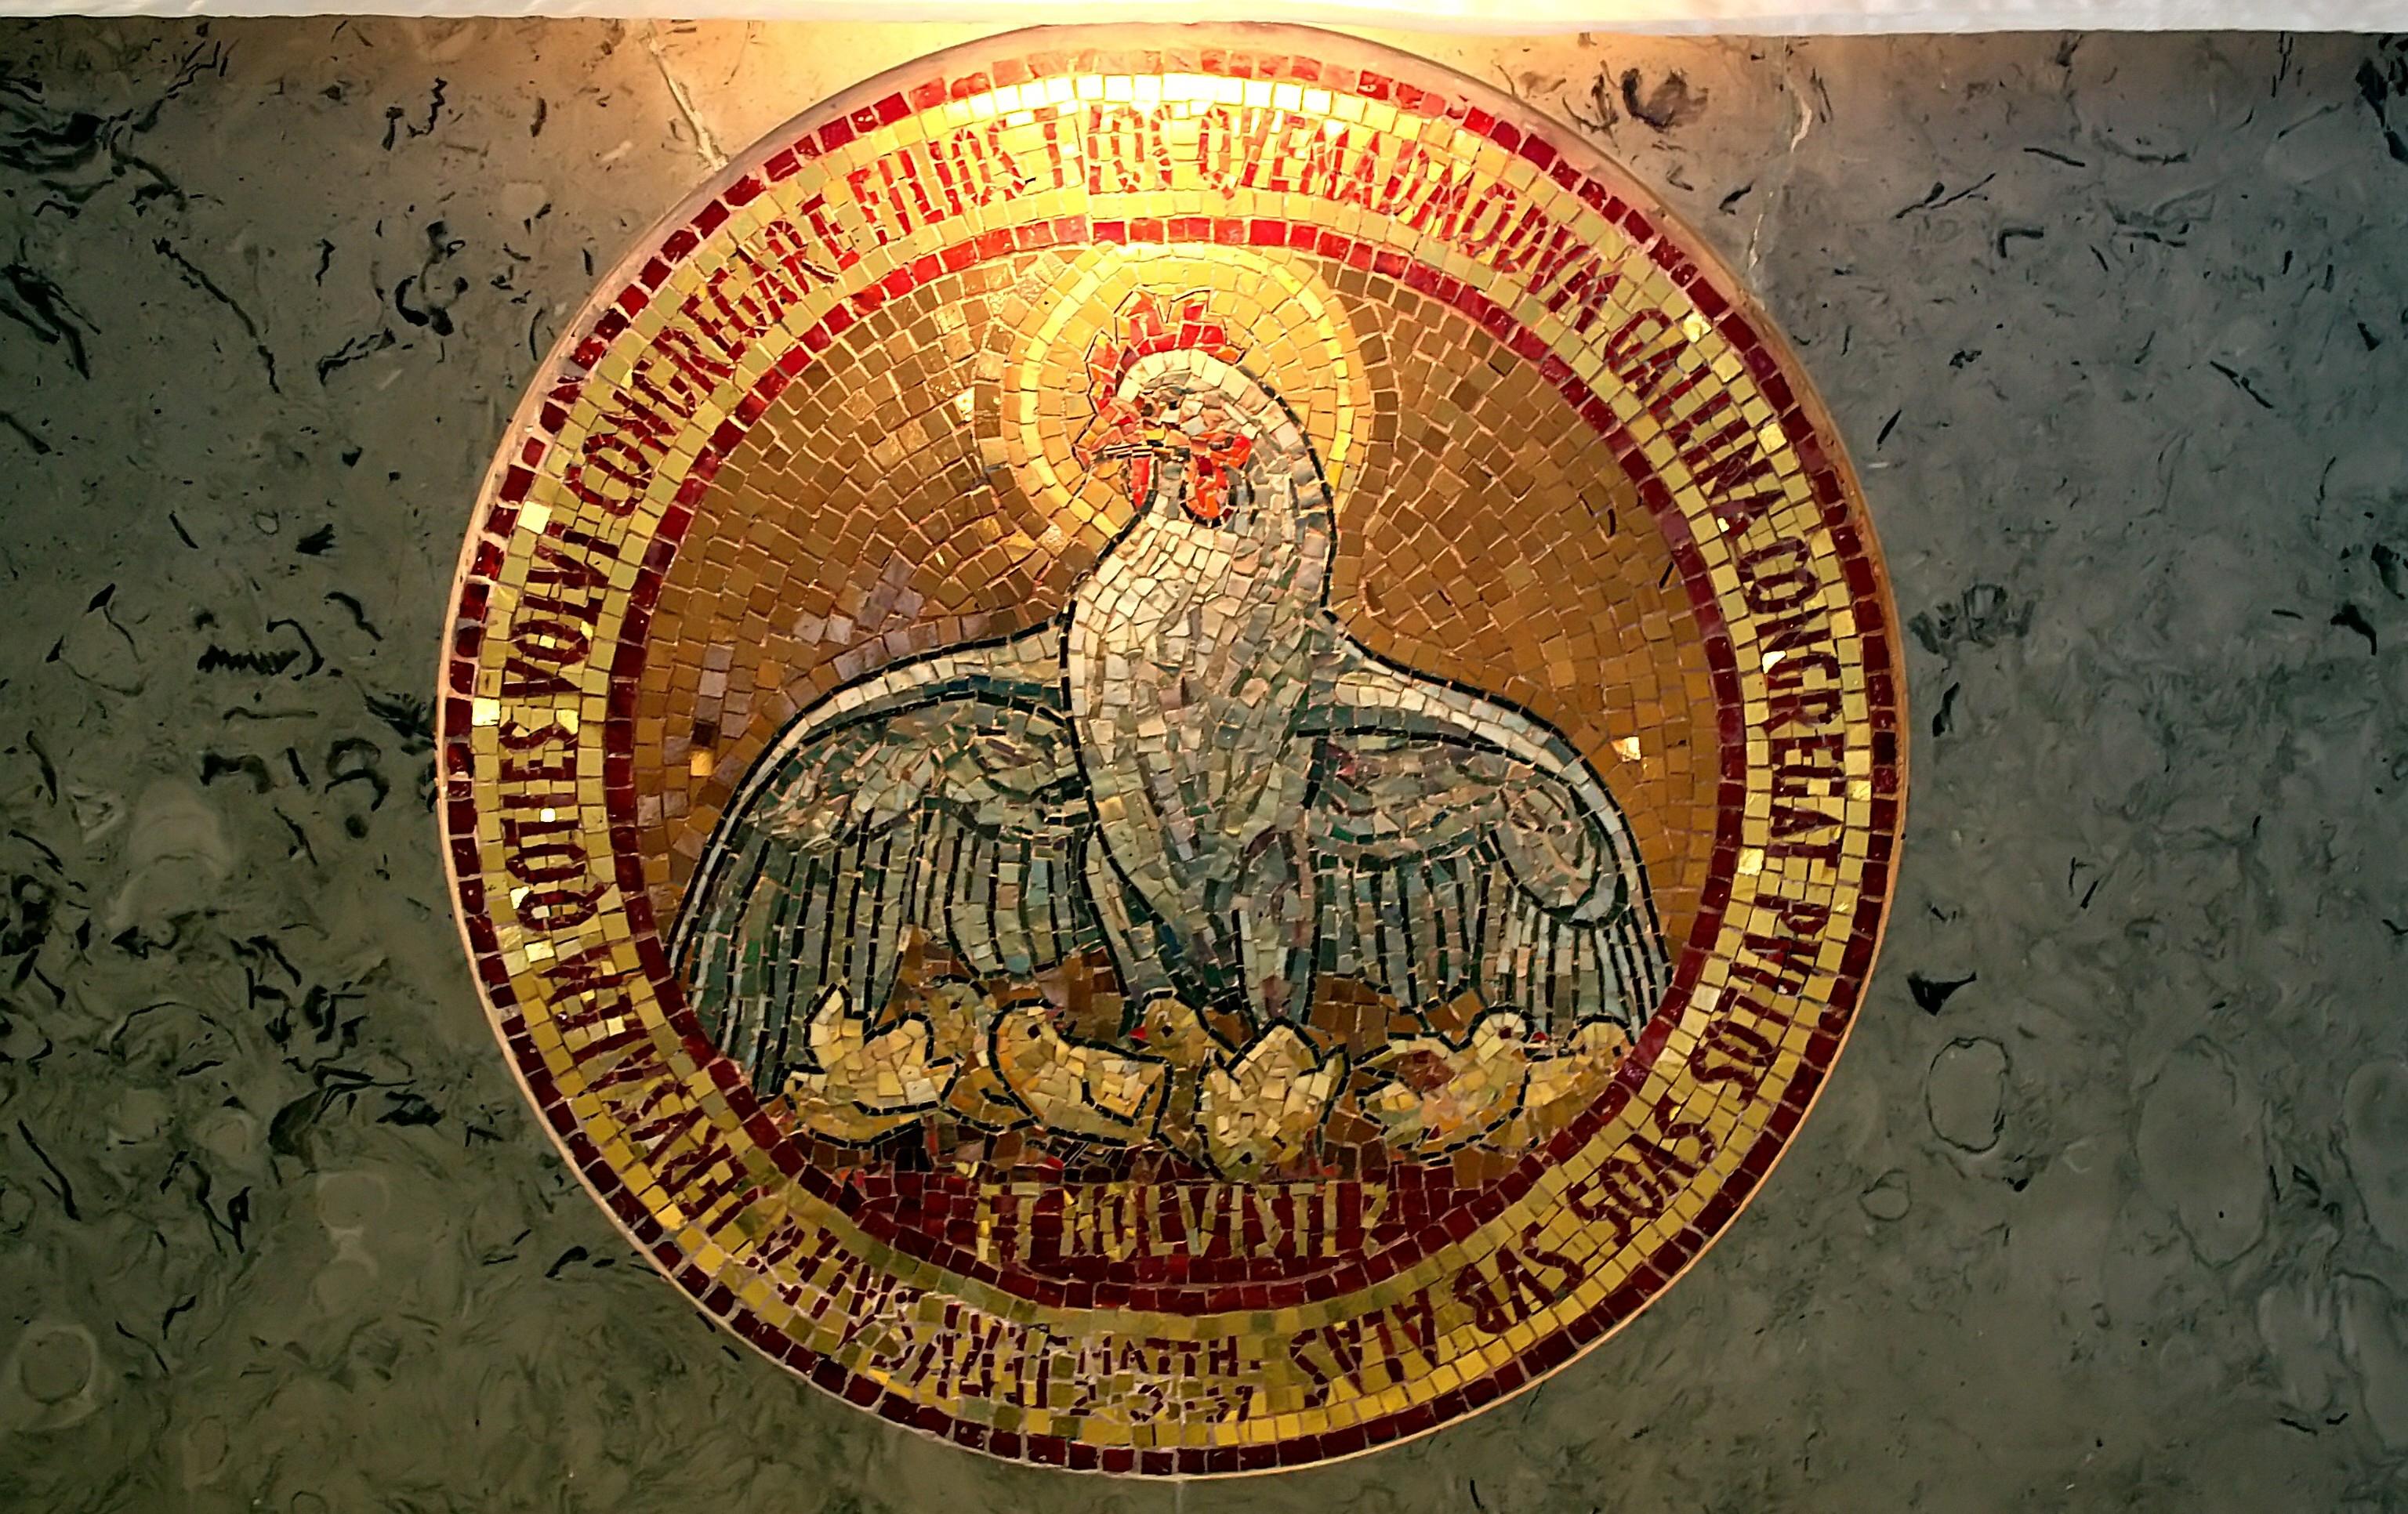 Mosaic Art at Dominus Flevit